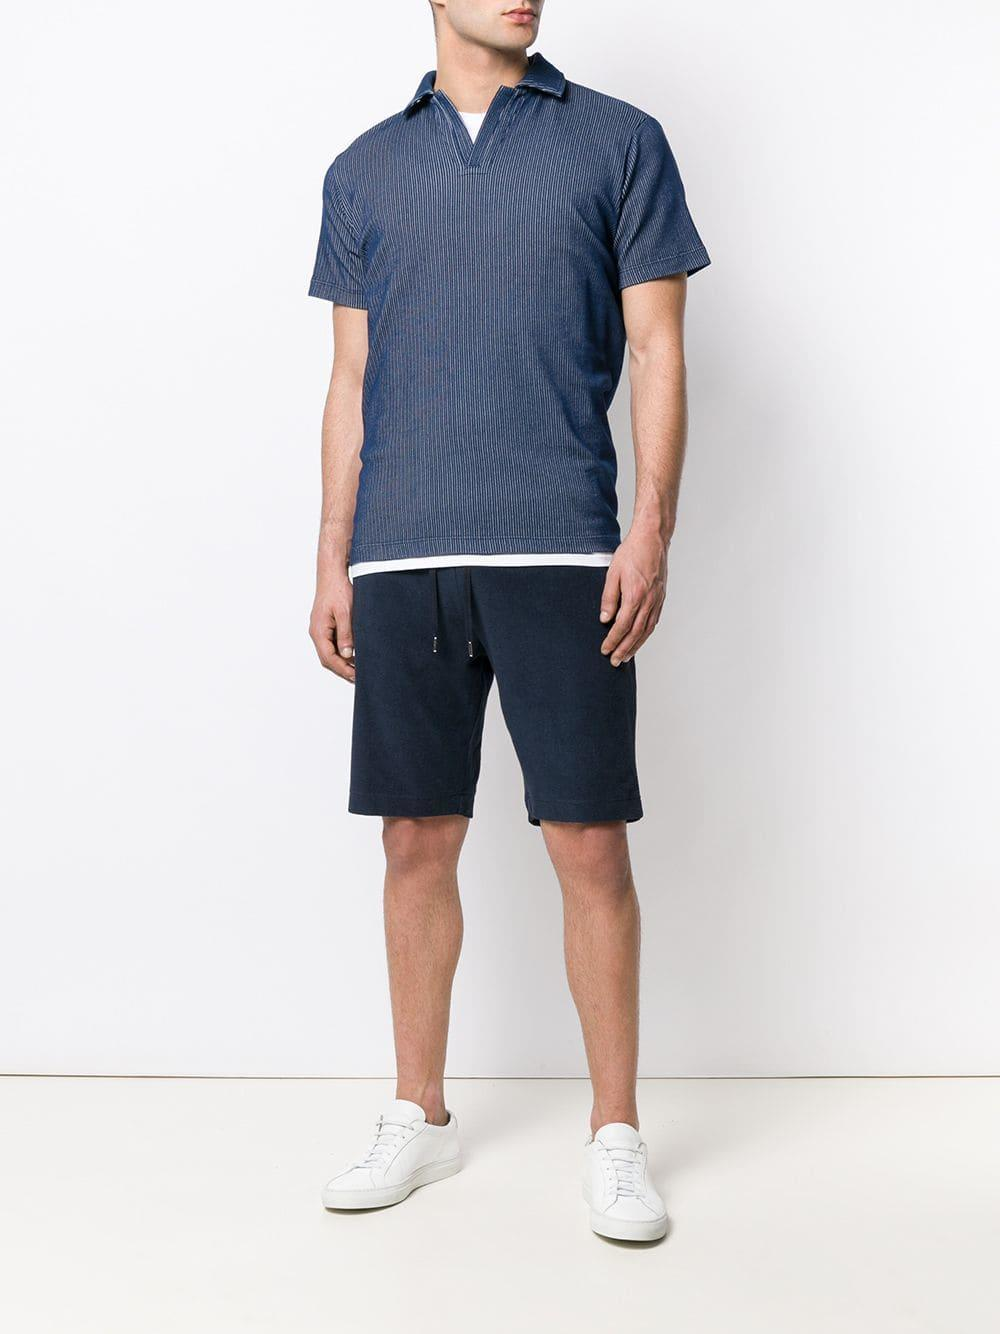 c100286881 Sunspel Drawstring Waist Shorts in Blue for Men - Lyst